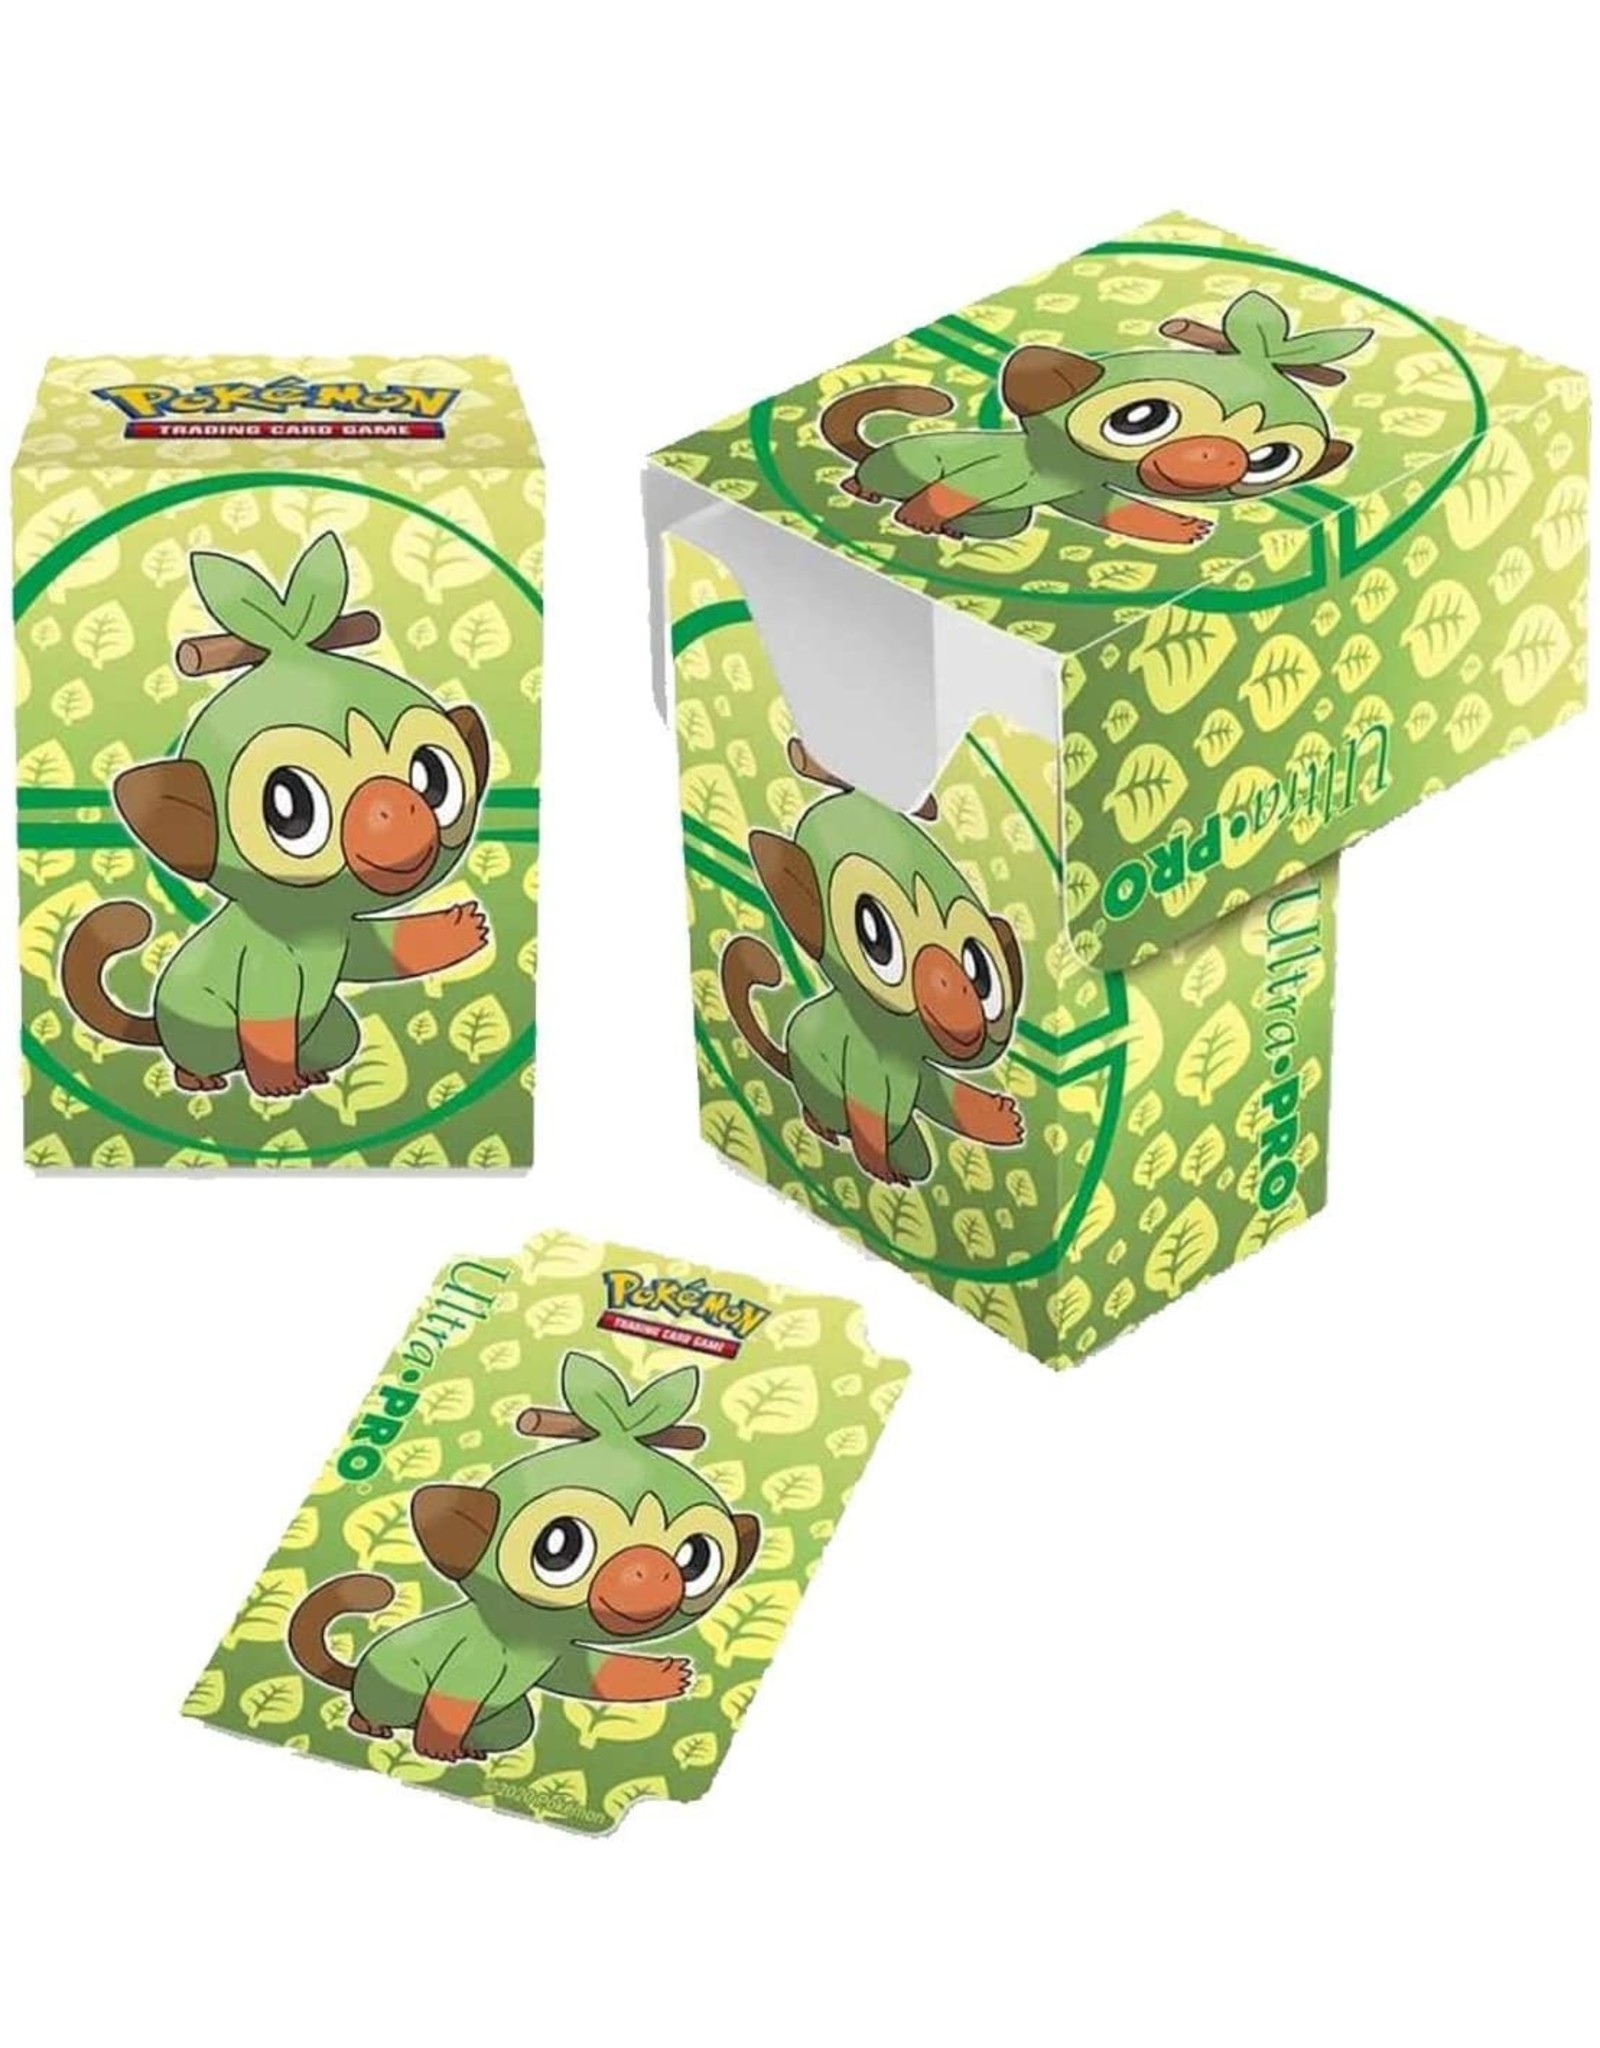 Pokémon Sword and Shield - Full Deck Box - Grookey